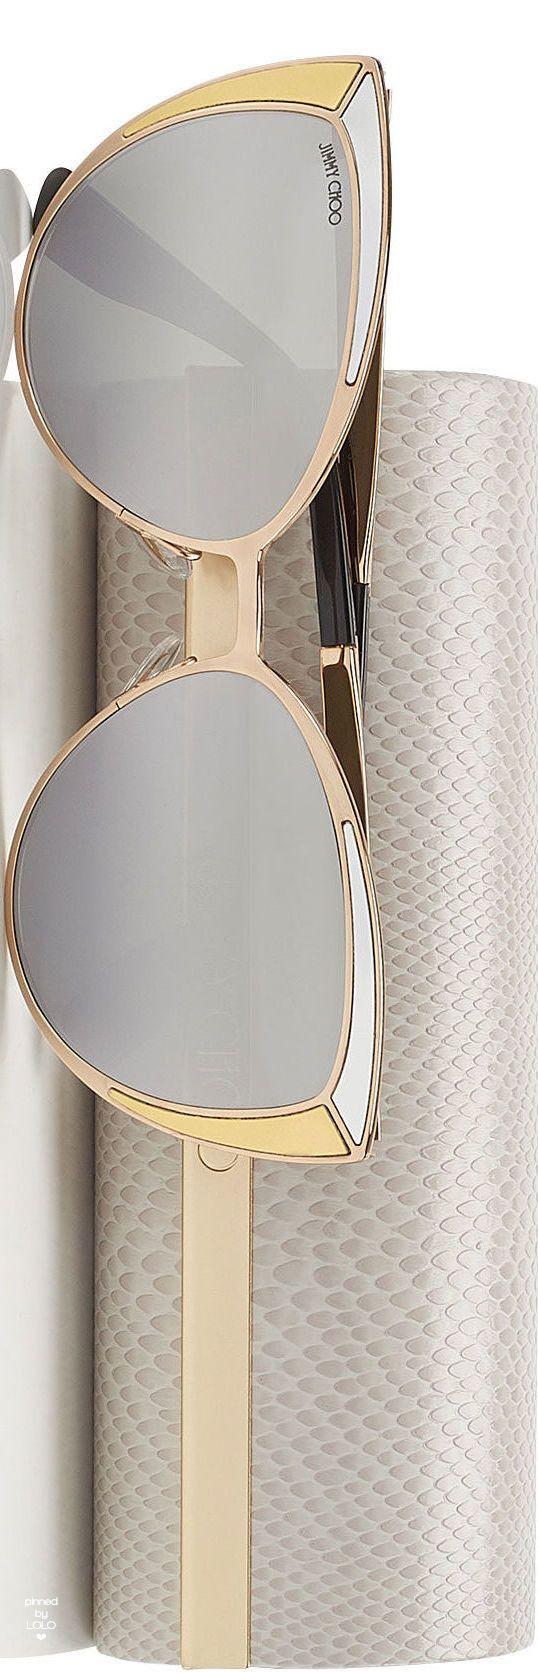 Jimmy Choo Domi Sunglasses And Case Fashion Eye Glasses Jimmy Choo Glasses Jimmy Choo Sunglasses